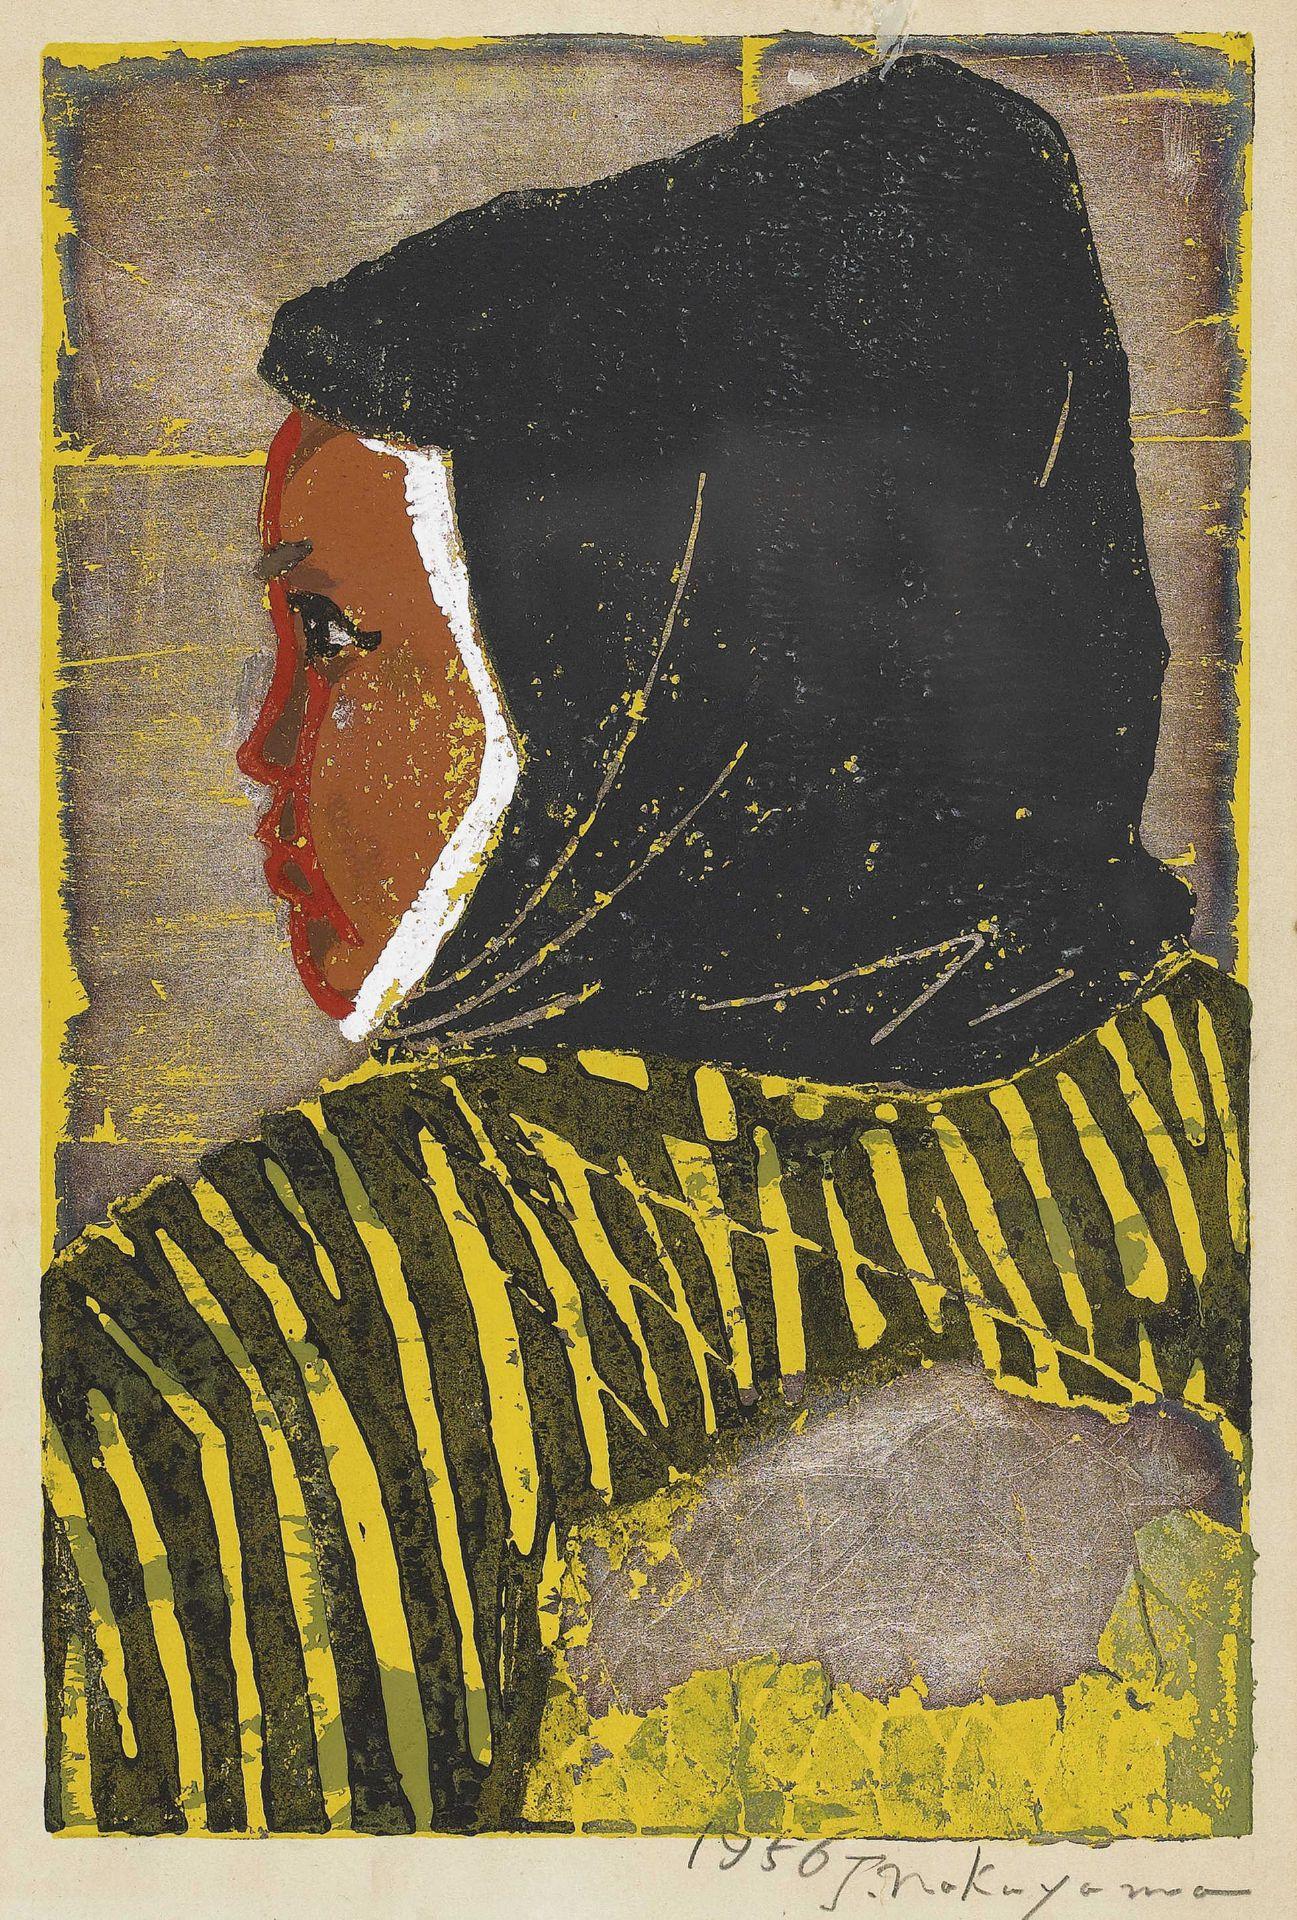 NAKAYAMA, TADASHI: Wife in profile.